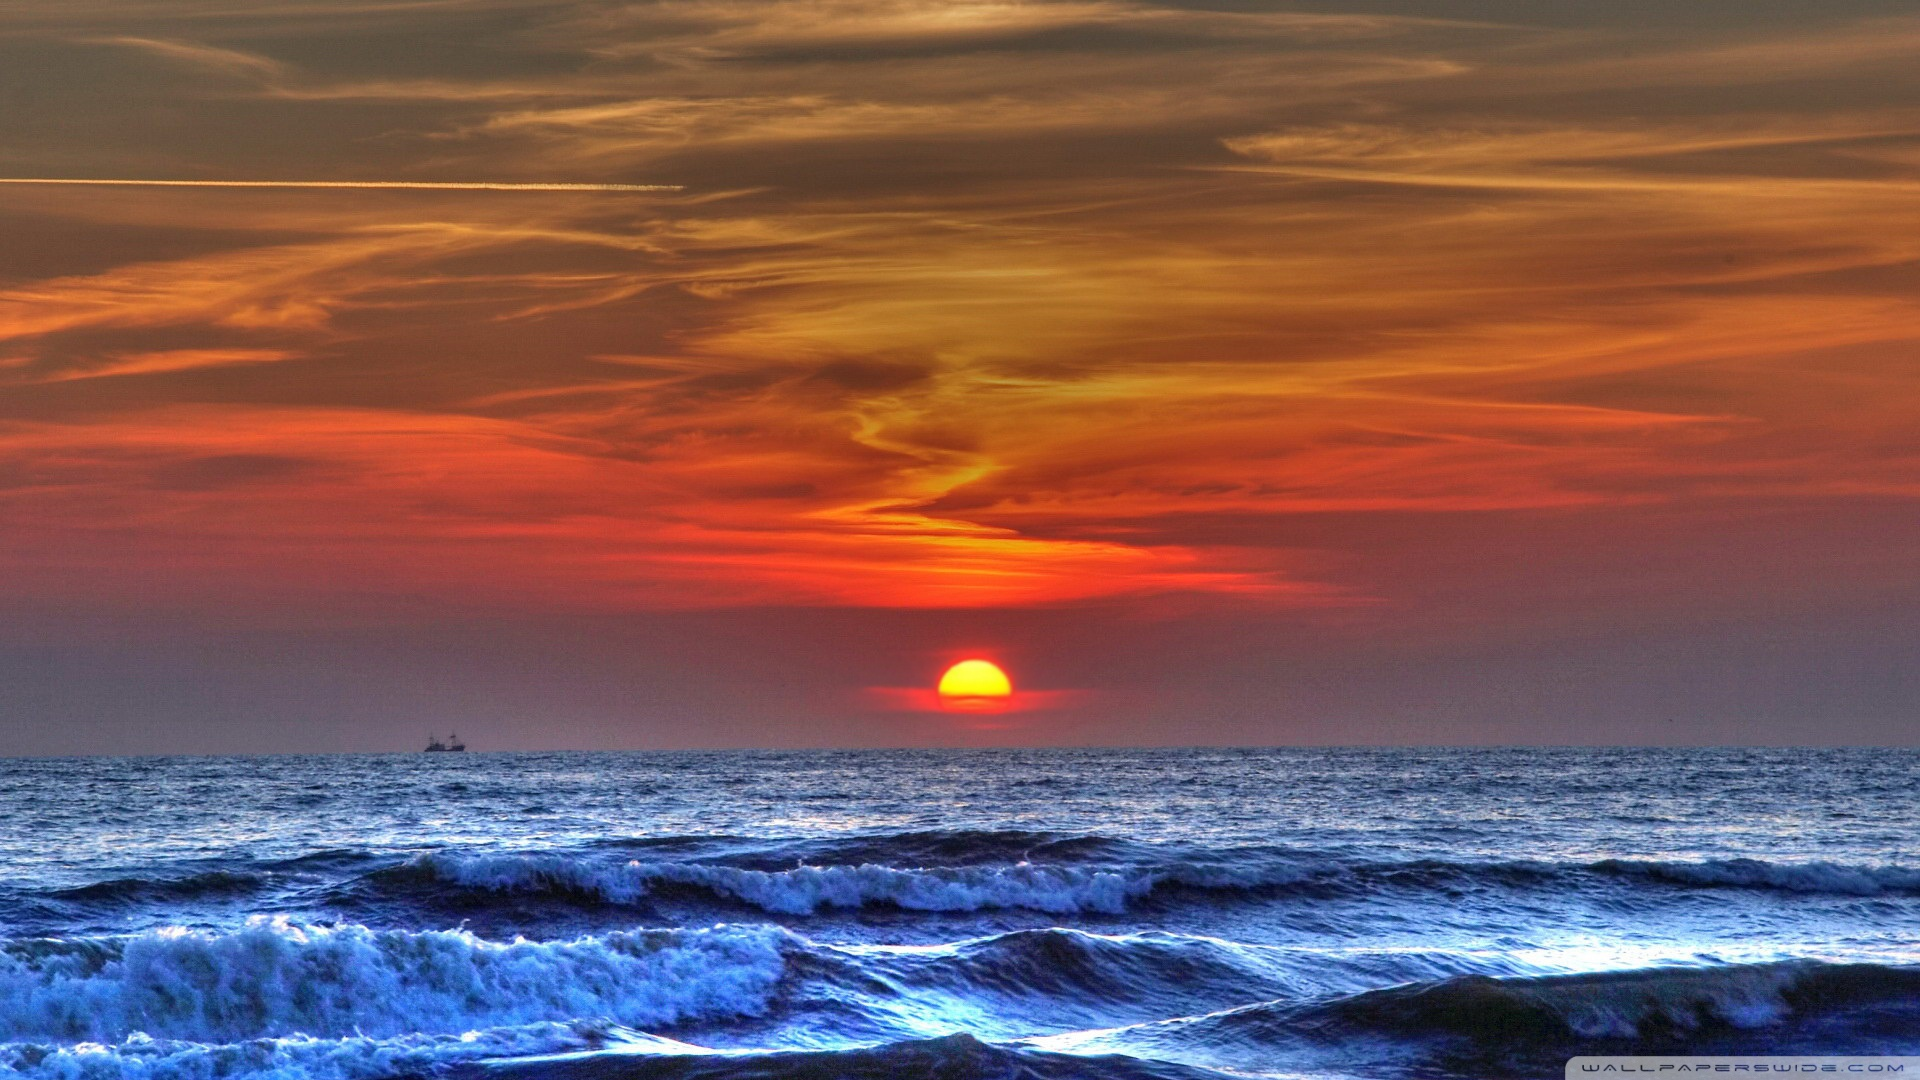 Sunset On The Beach 9 Wallpaper 1920x1080 Sunset, On, The, Beach, 9